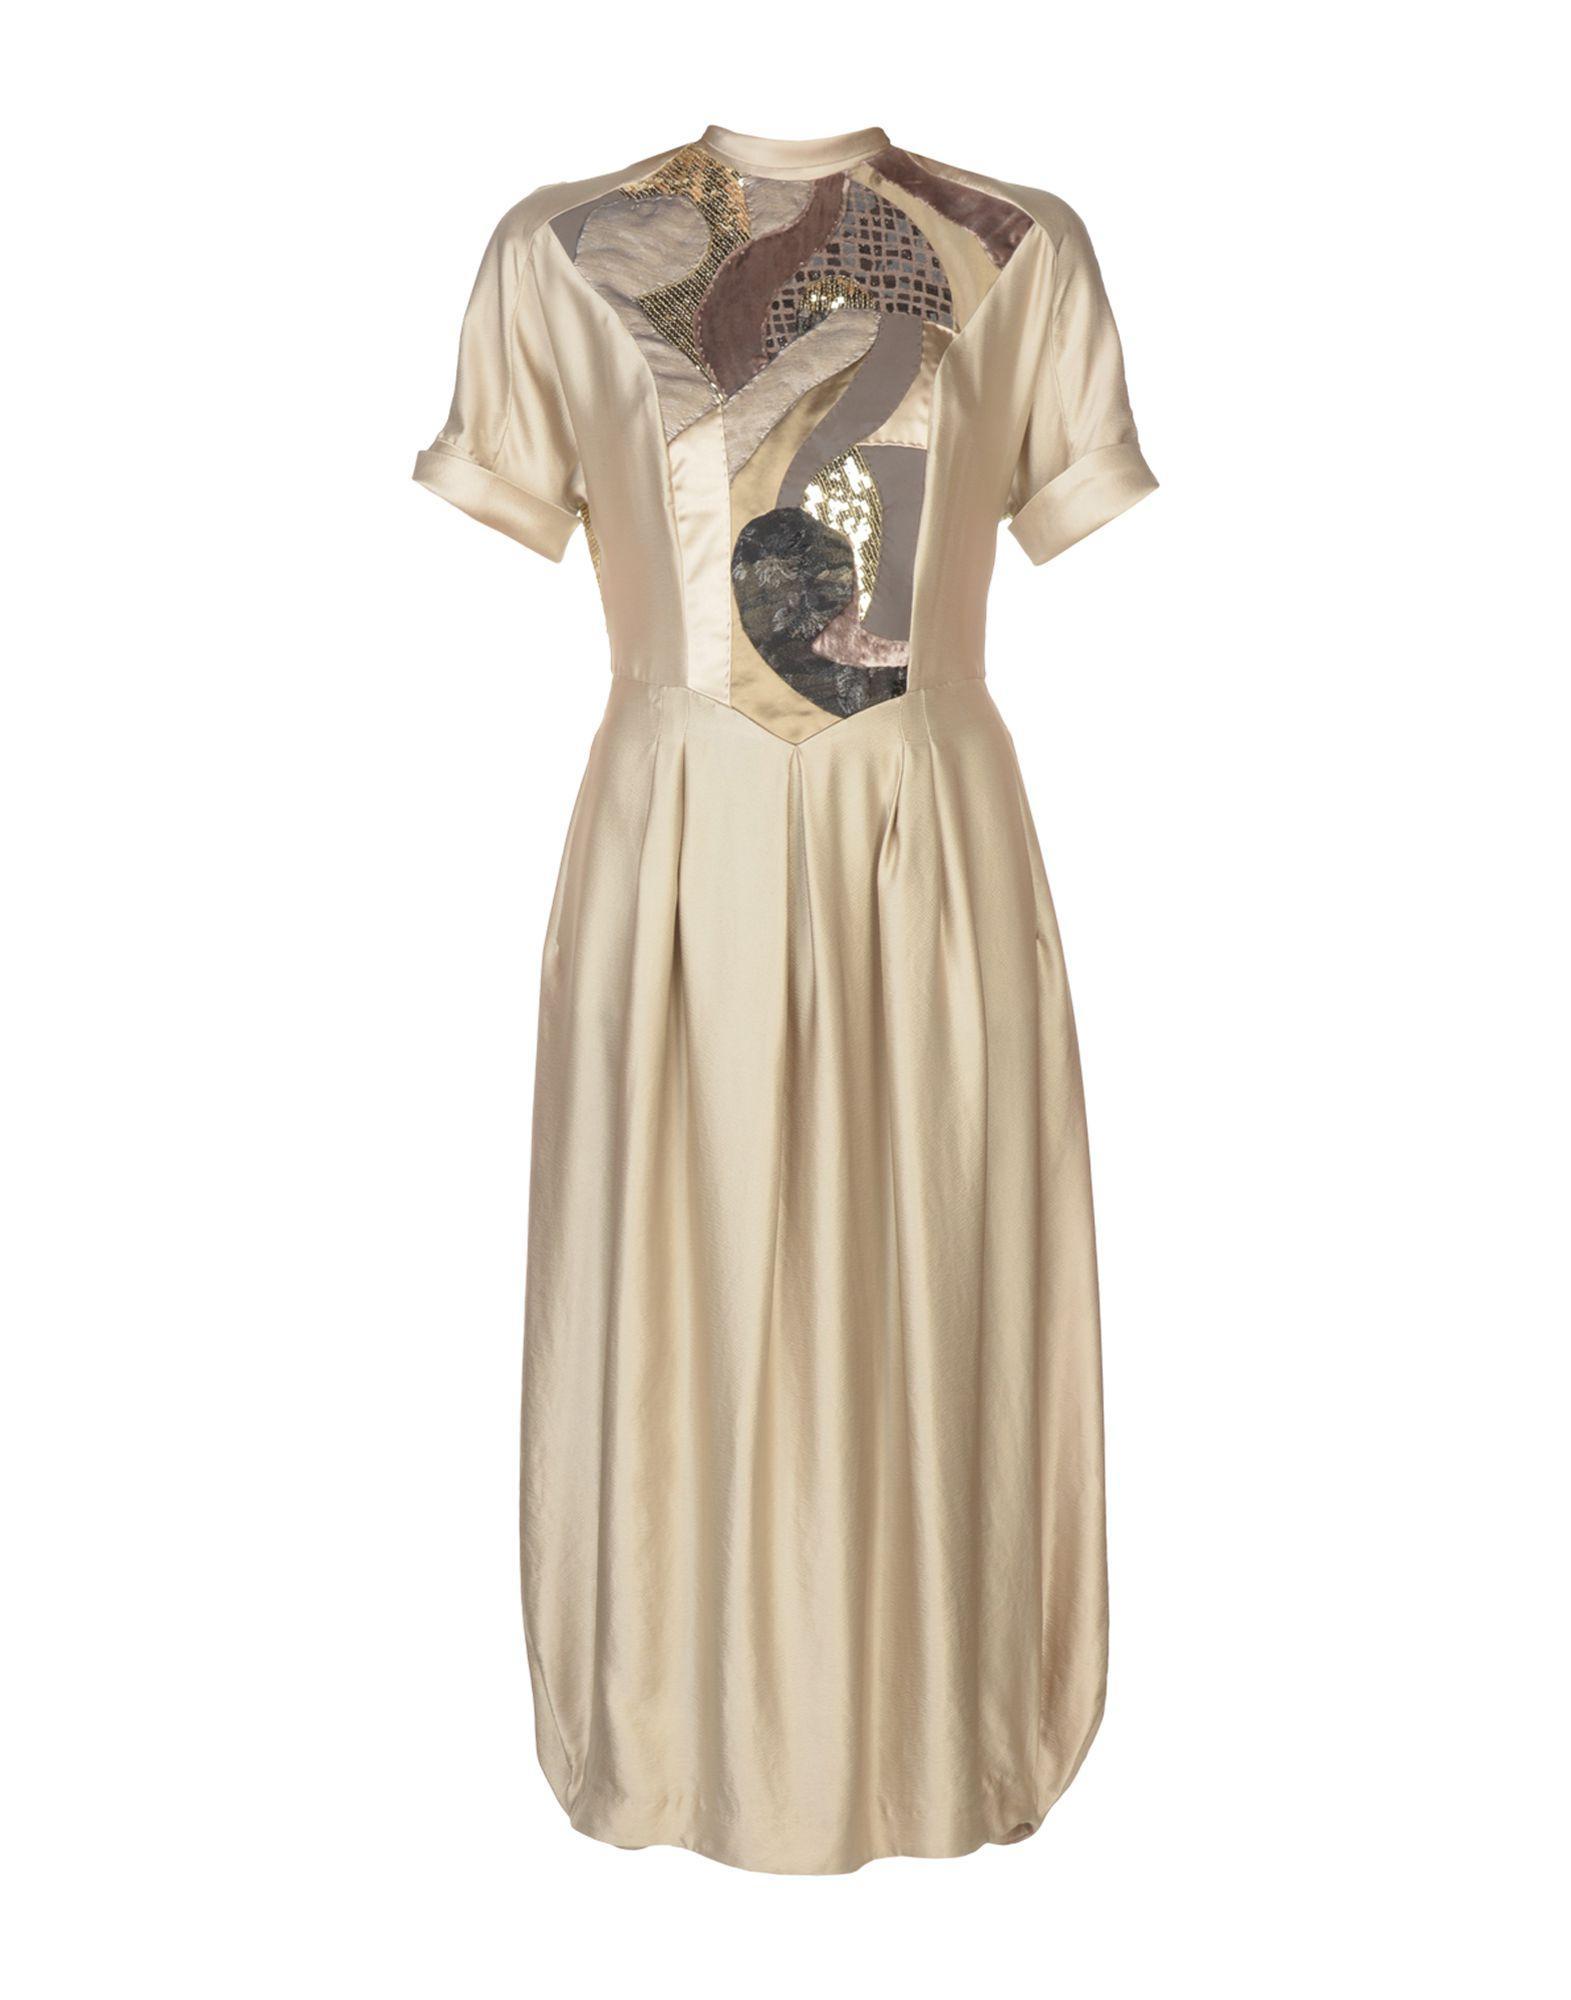 Antonio Marras Formal Dress In Beige